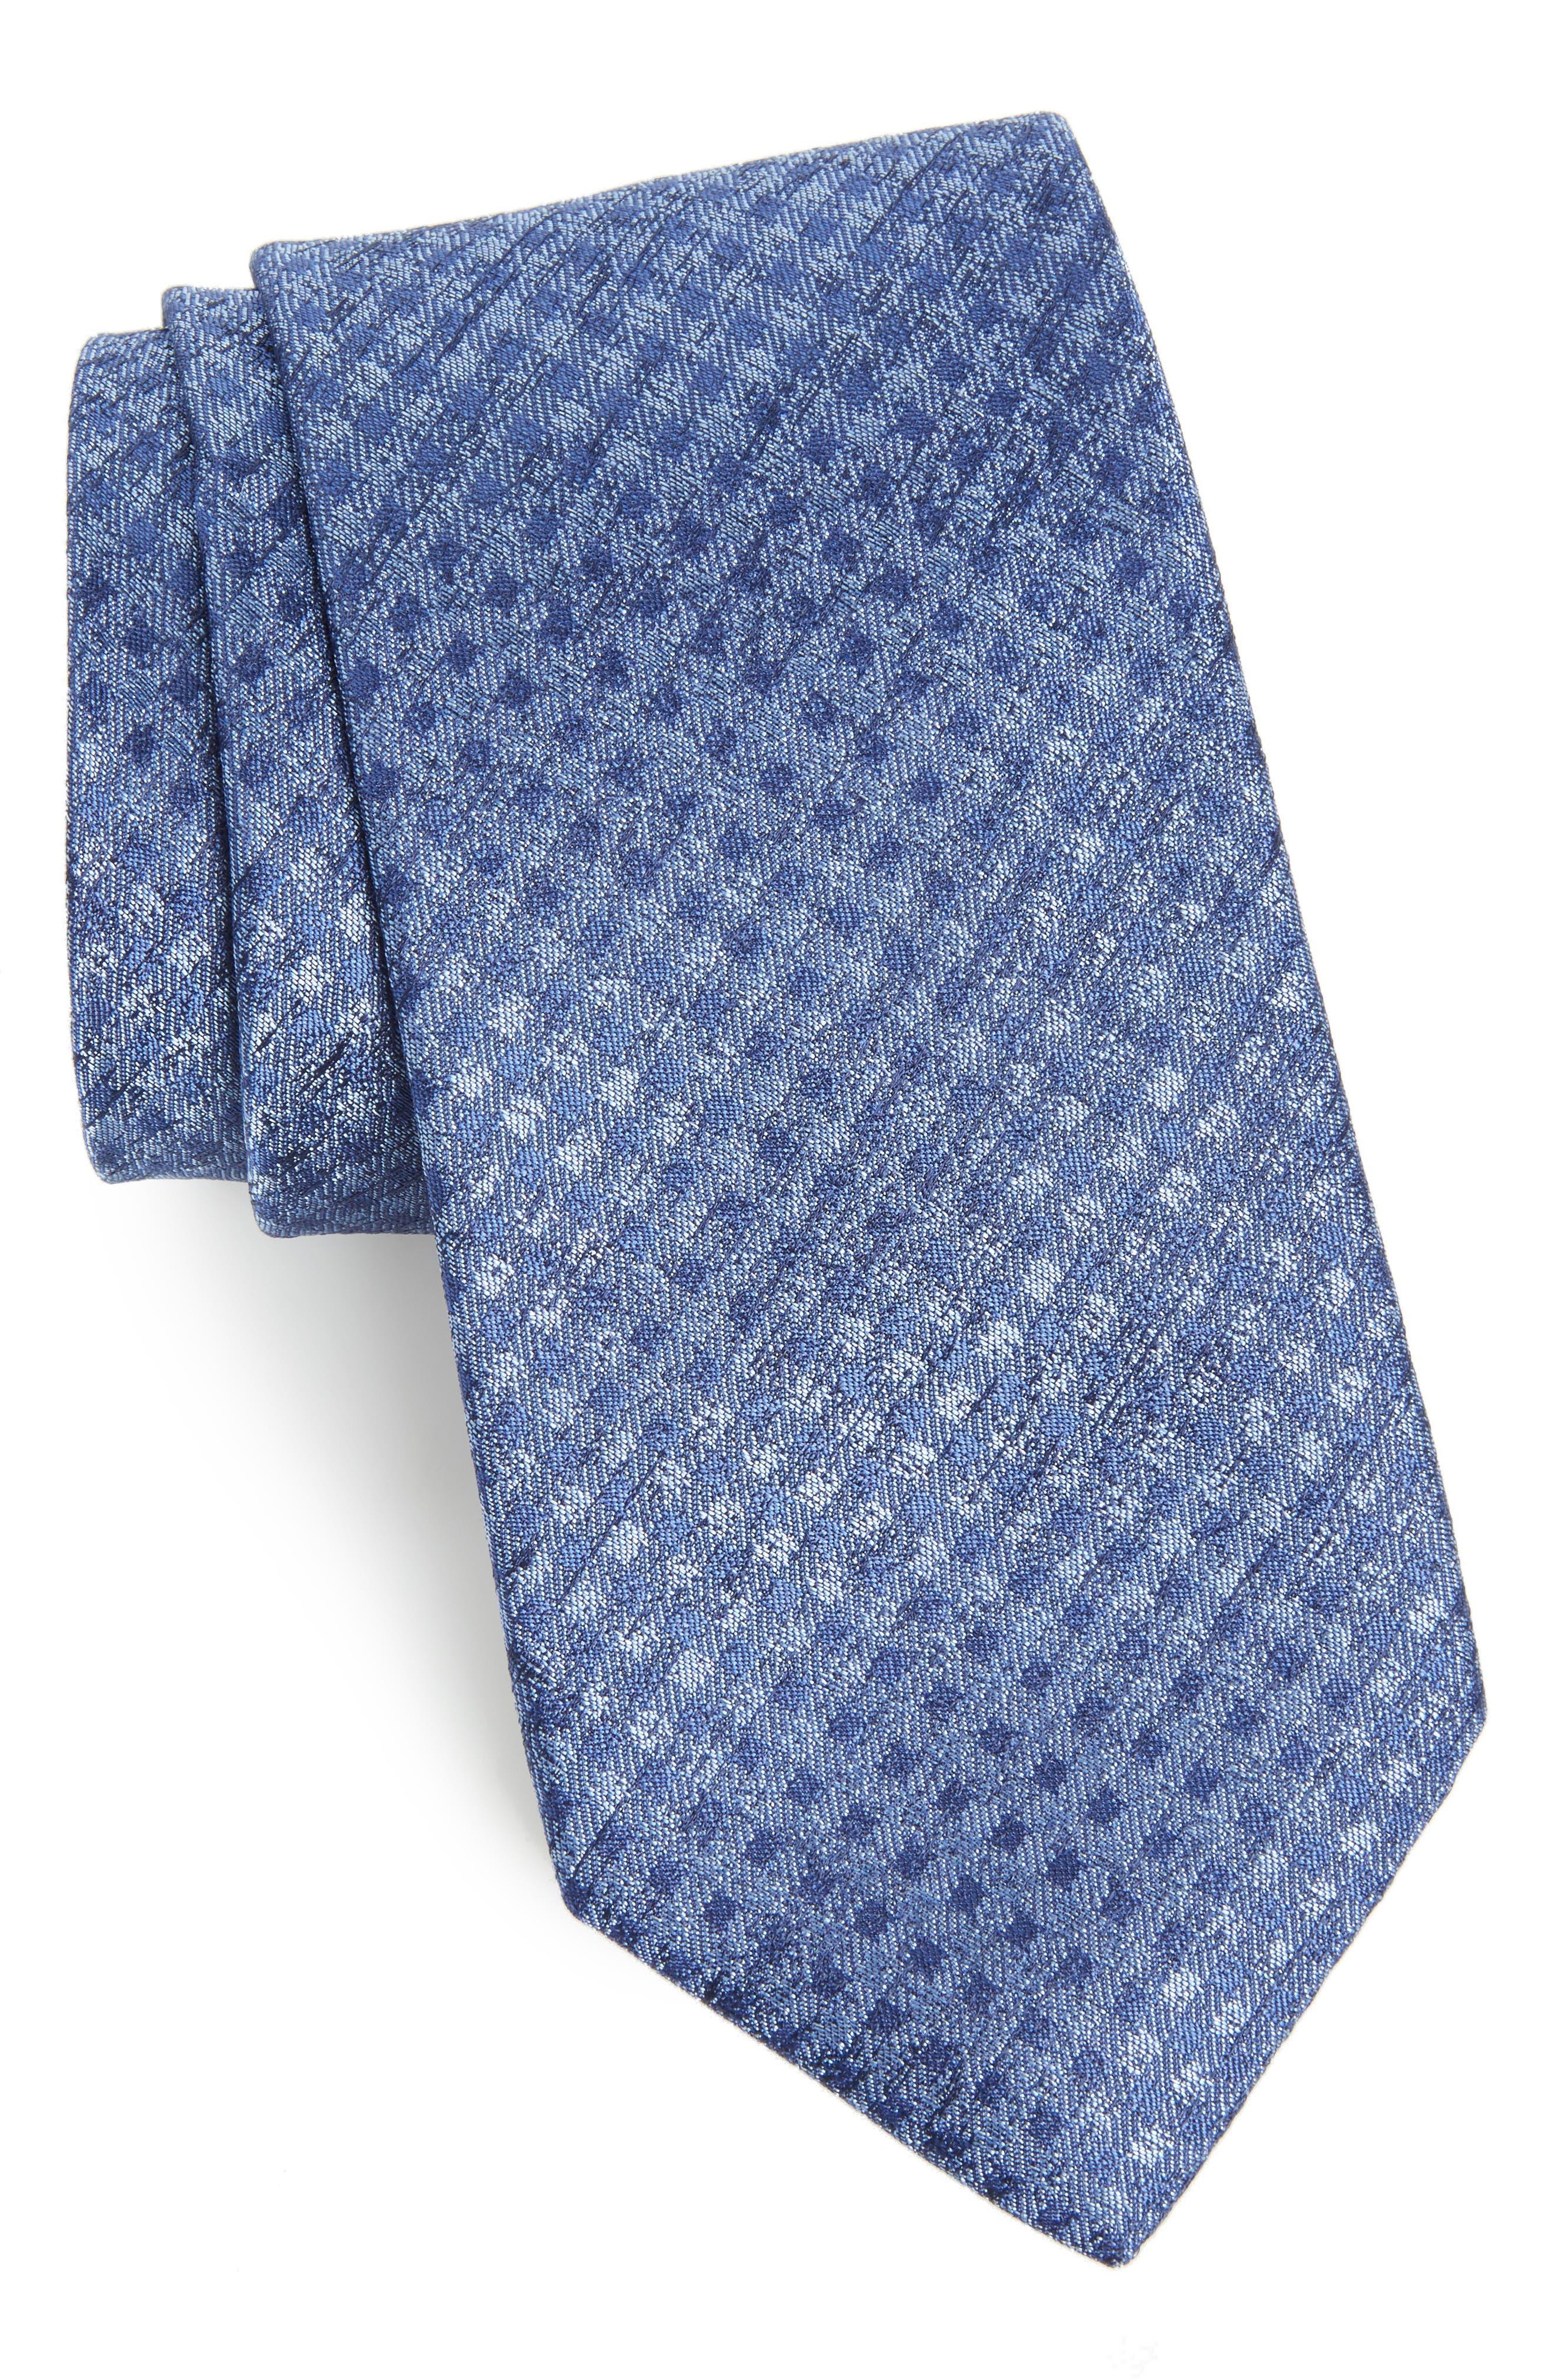 Porter Check Silk Tie,                         Main,                         color, 400